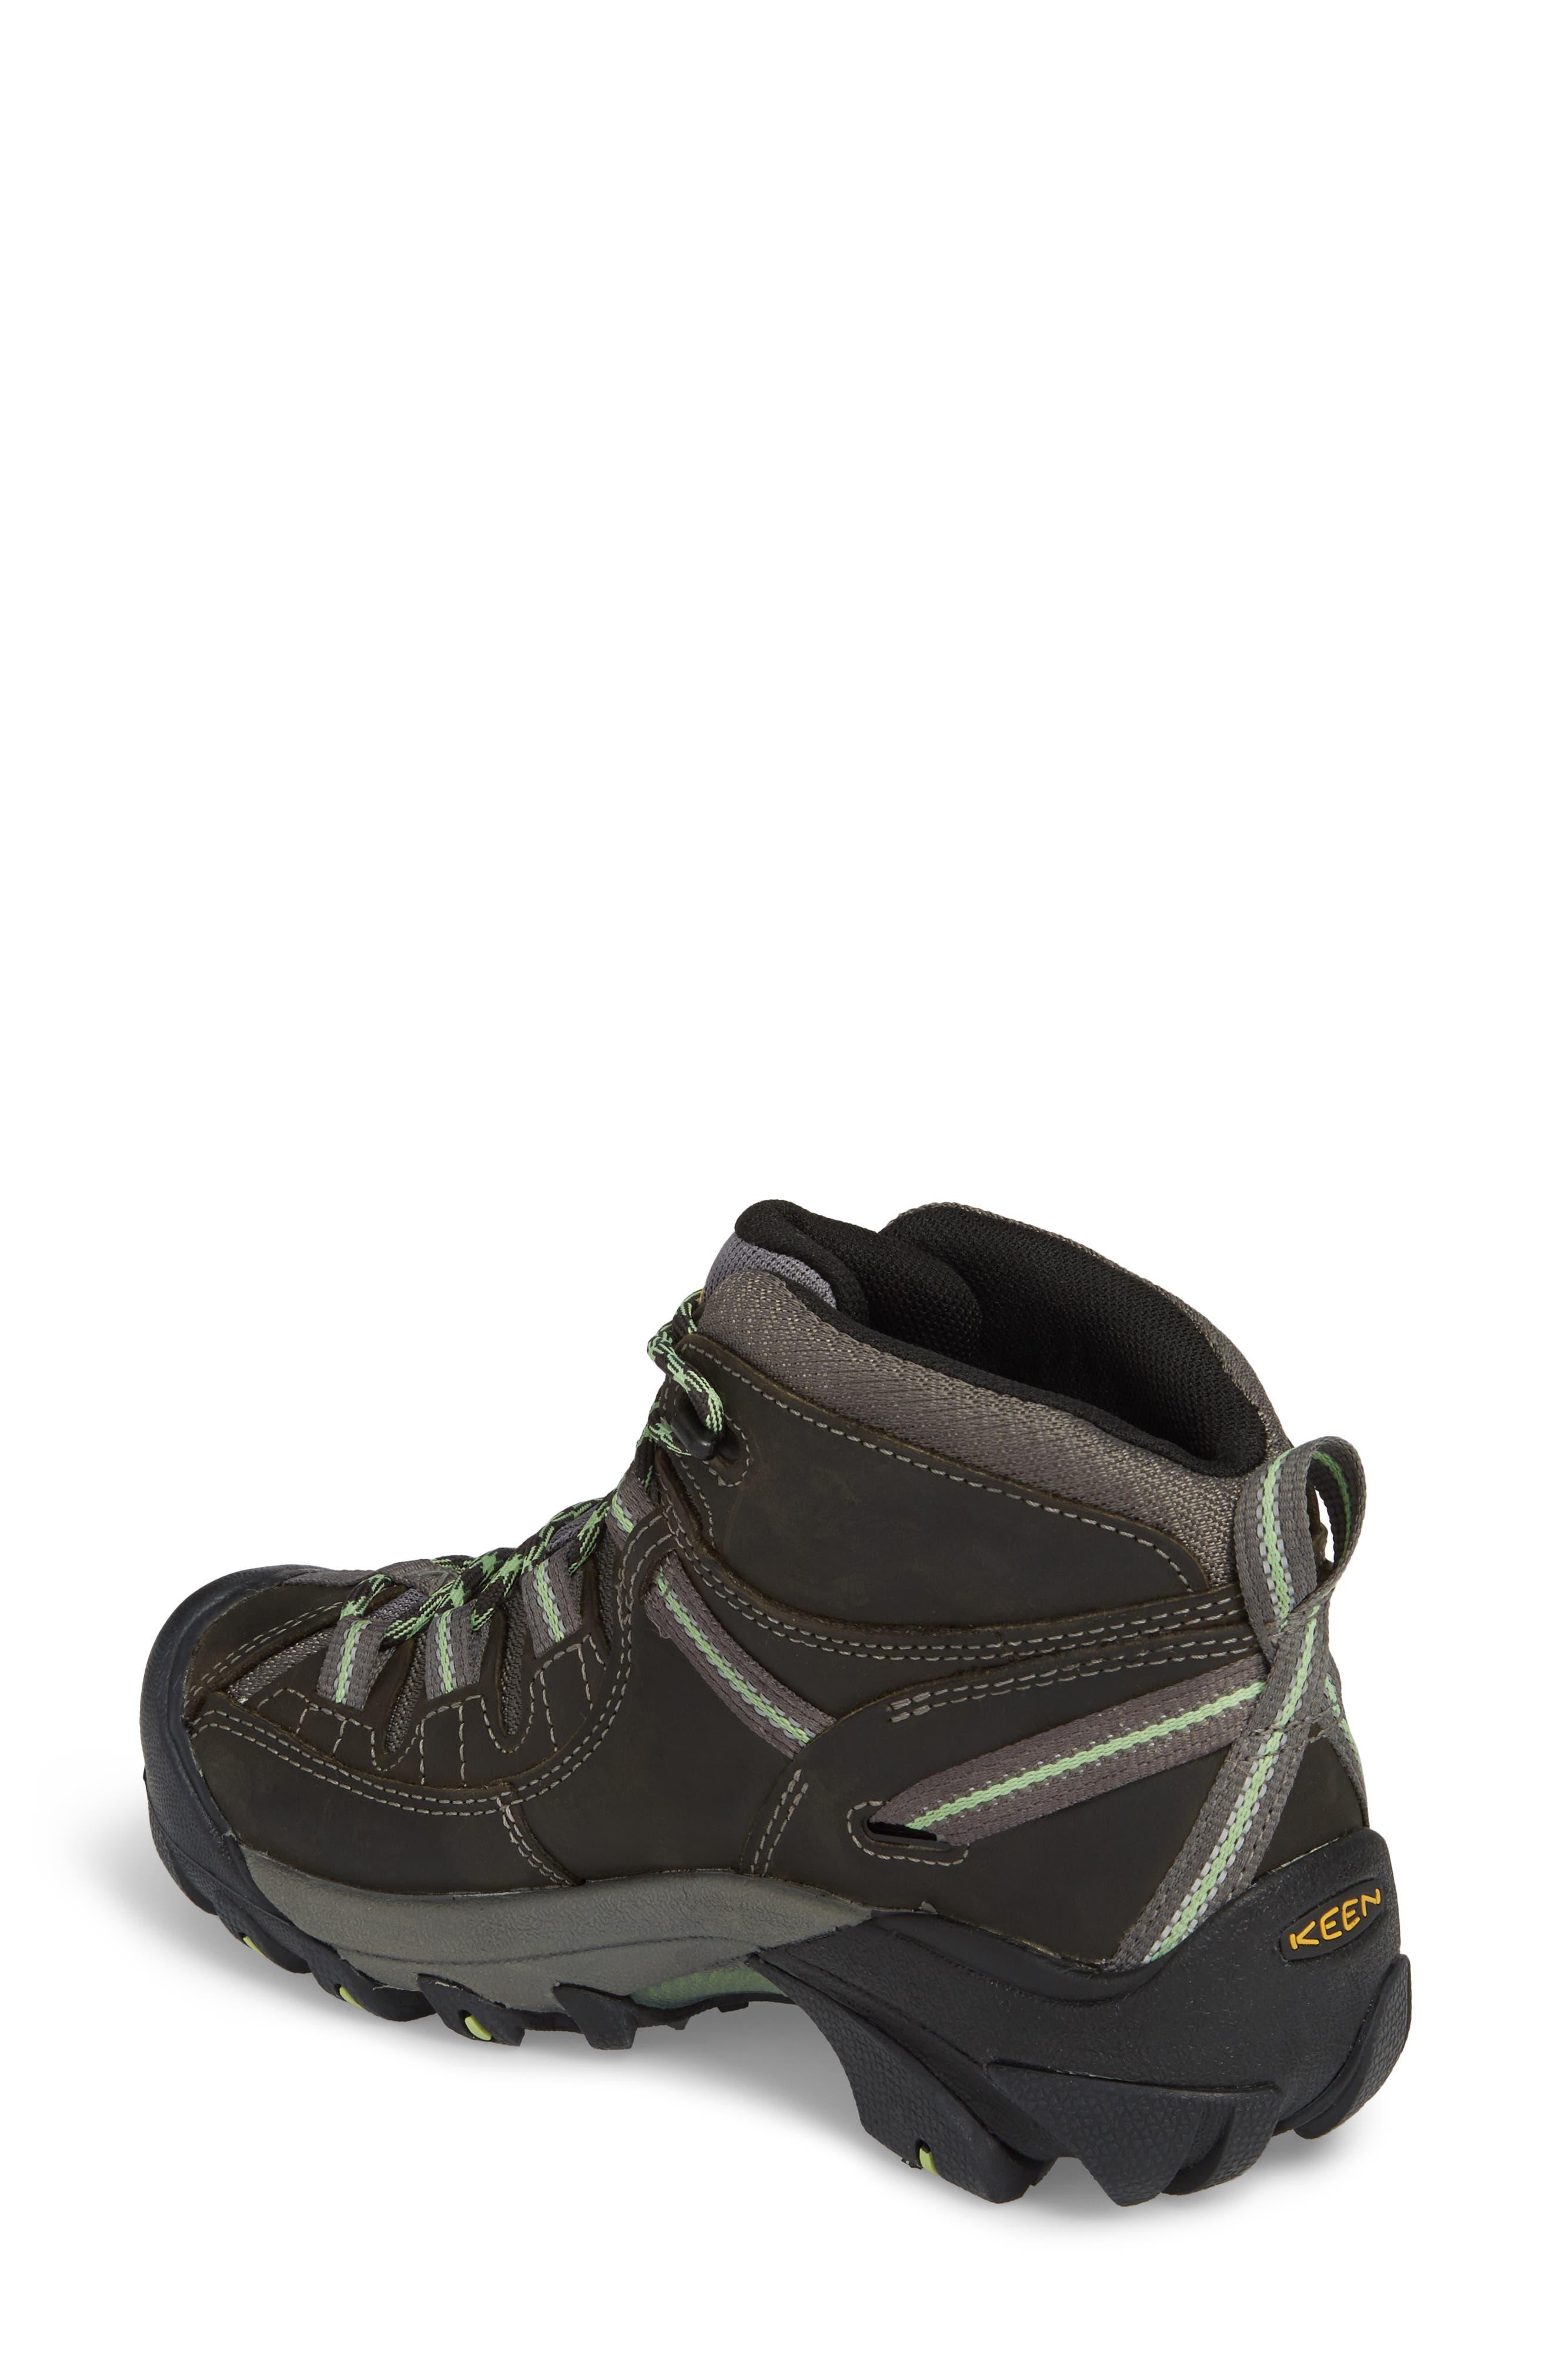 Targhee II Mid Waterproof Hiking Boot,                             Alternate thumbnail 2, color,                             RAVEN/ OPALINE